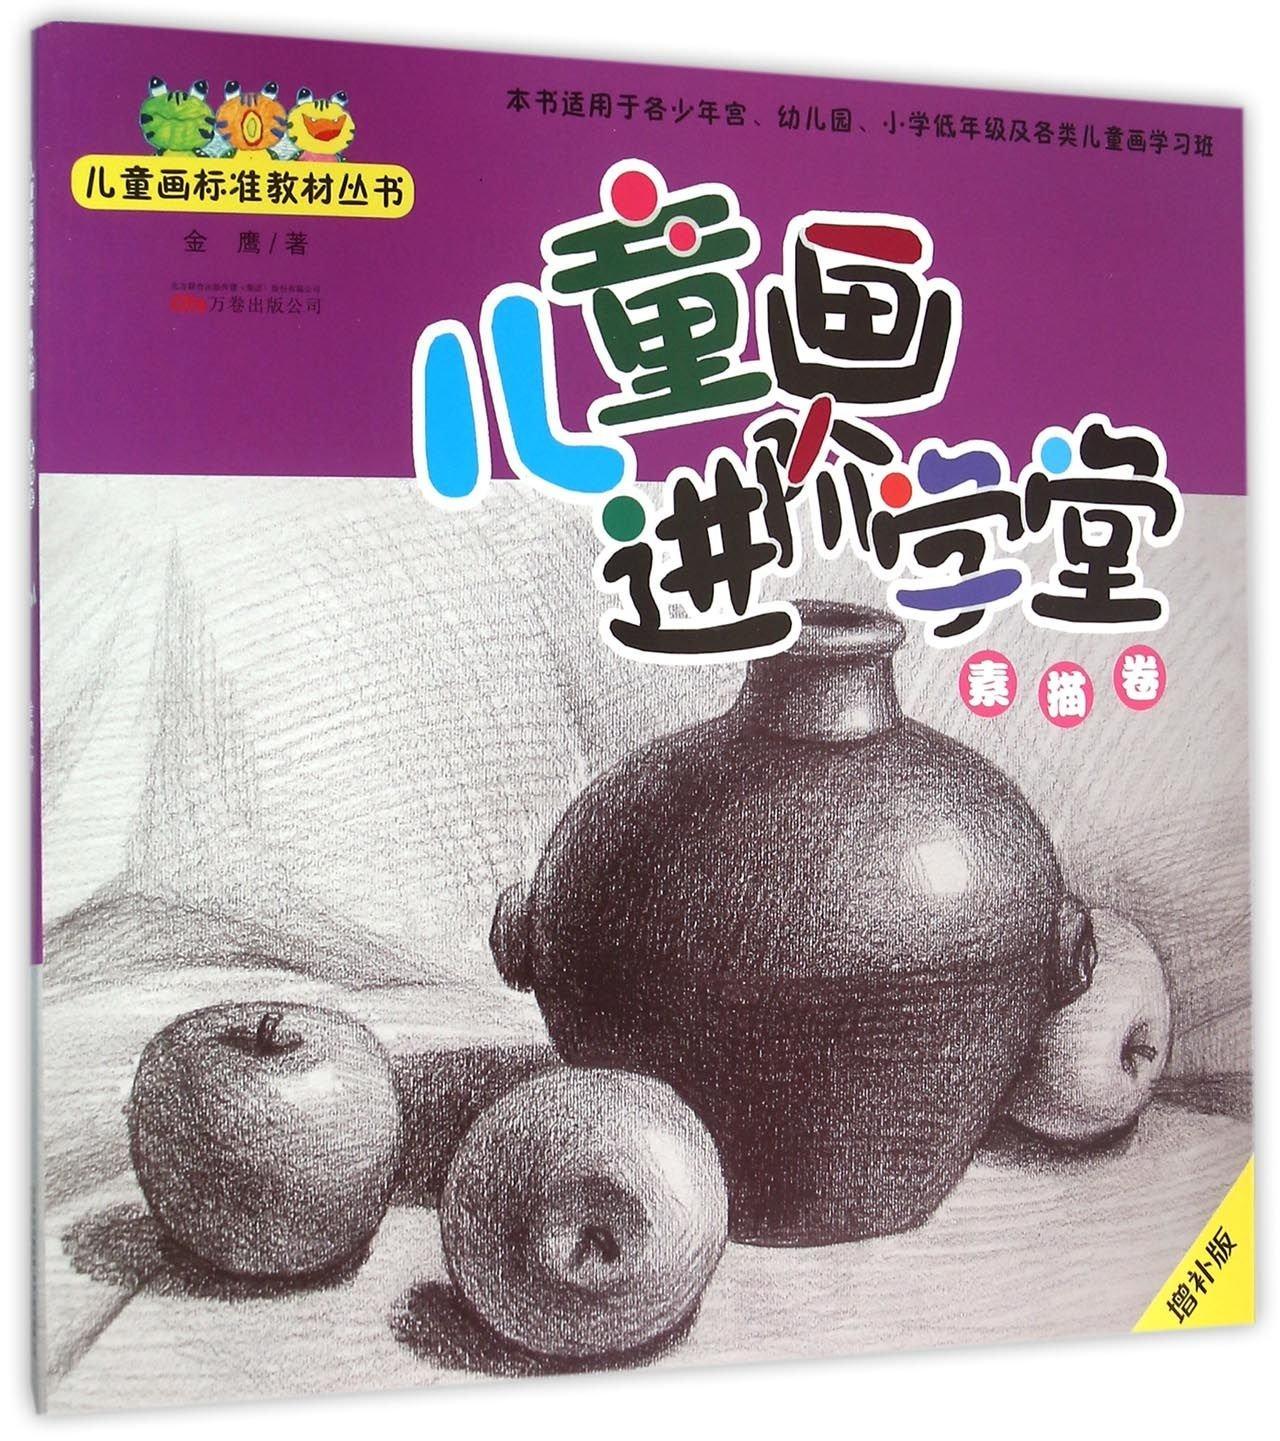 Read Online 儿童画进阶学堂(素描卷增补版)/儿童画标准教材丛书 pdf epub